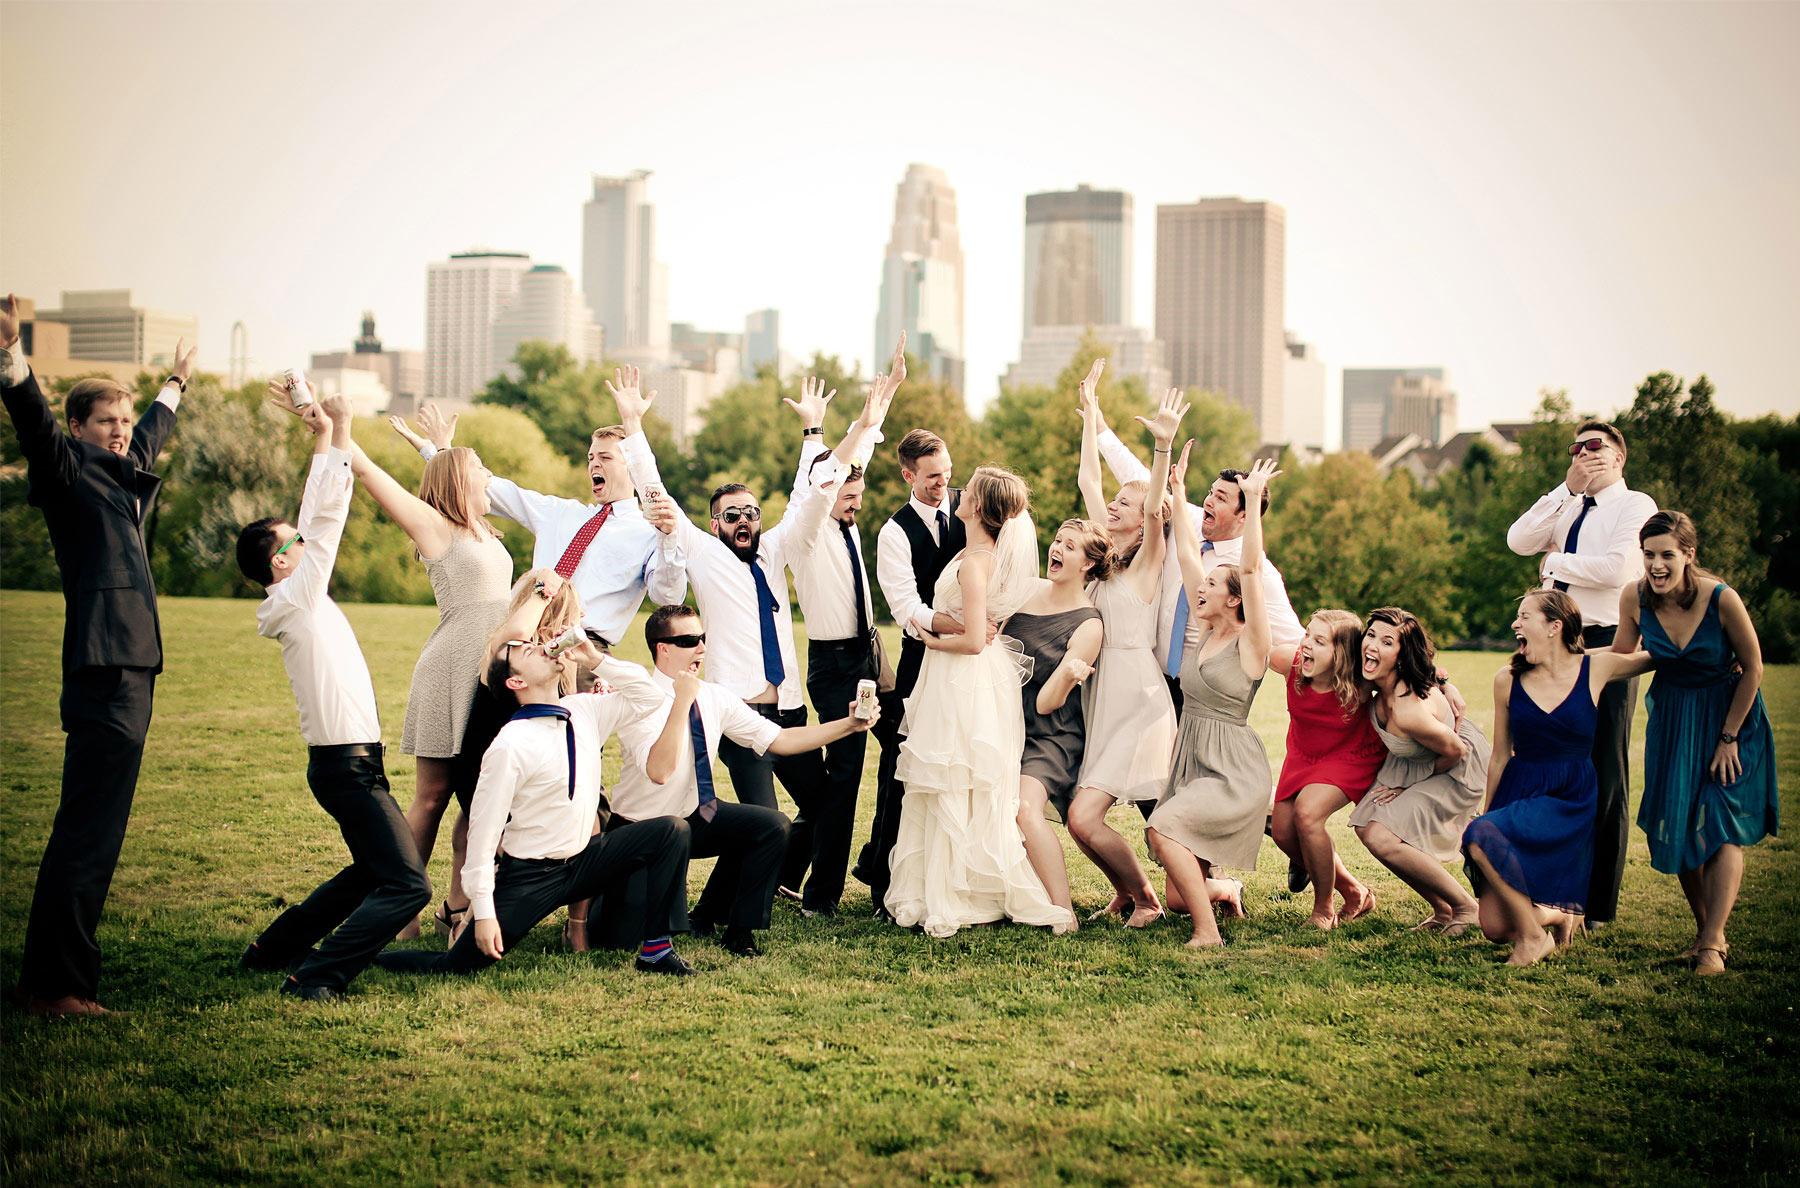 12-Minneapolis-Minnesota-Wedding-Photography-by-Vick-Photography-Wedding-Party-Group-Skyline-Jess-&-Jake.jpg